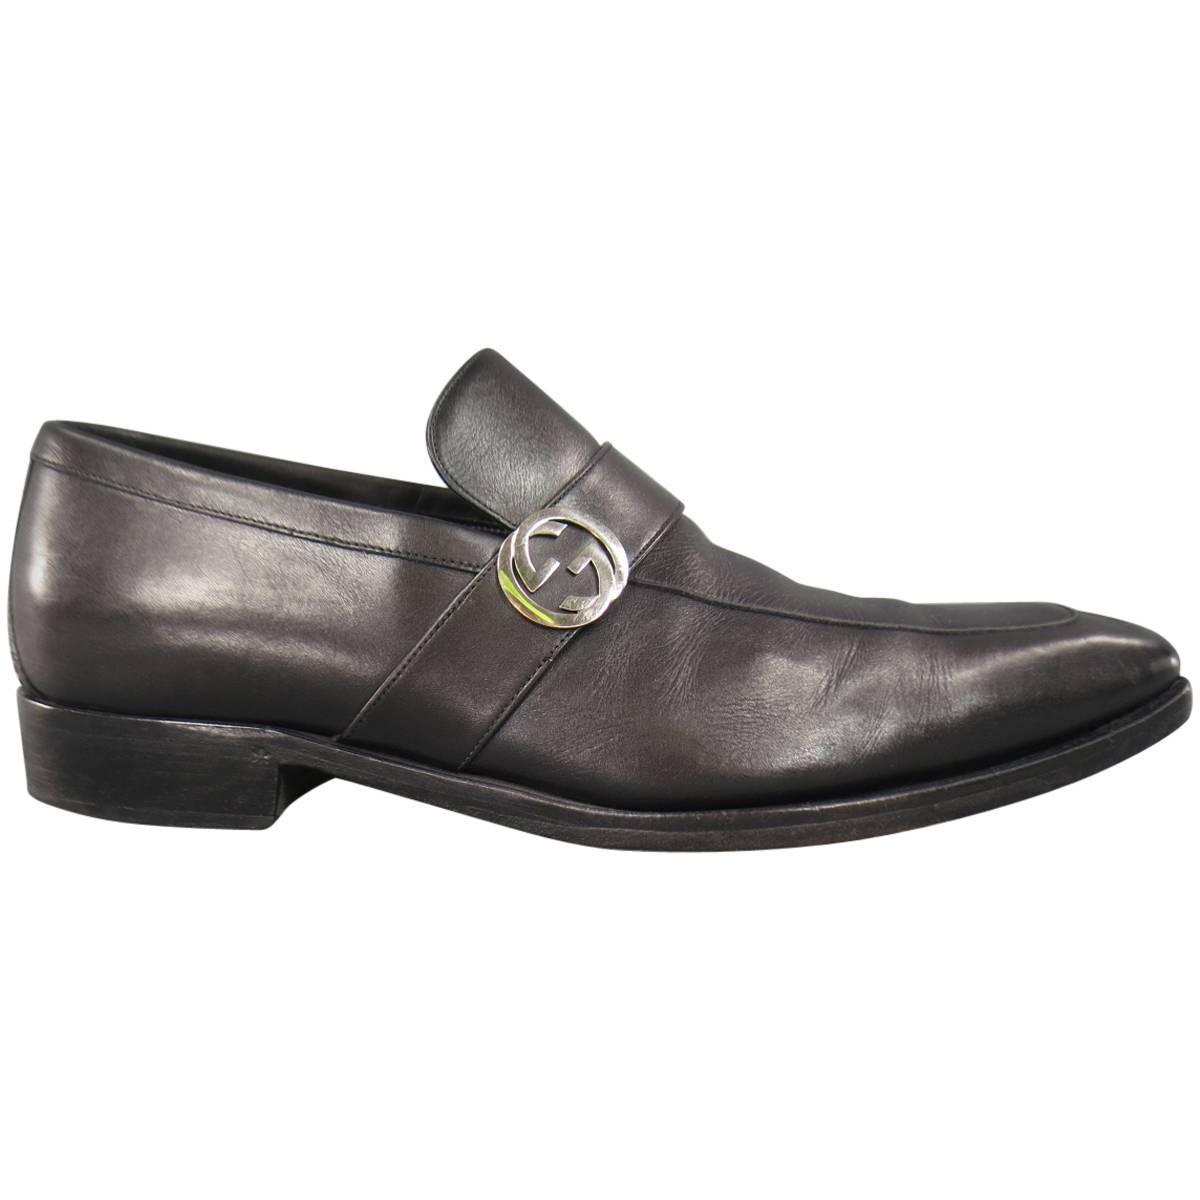 Menu0026#39;s GUCCI Size 9 Black Leather Silver GG logo Slip On ...